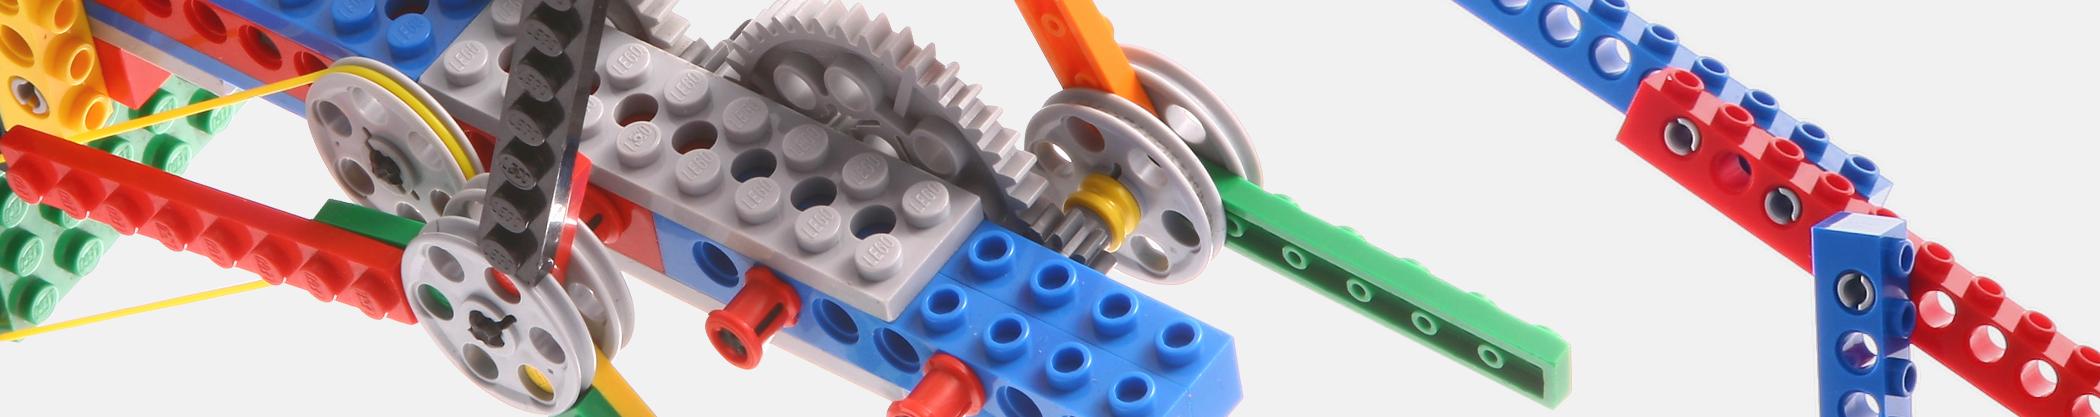 some-lego